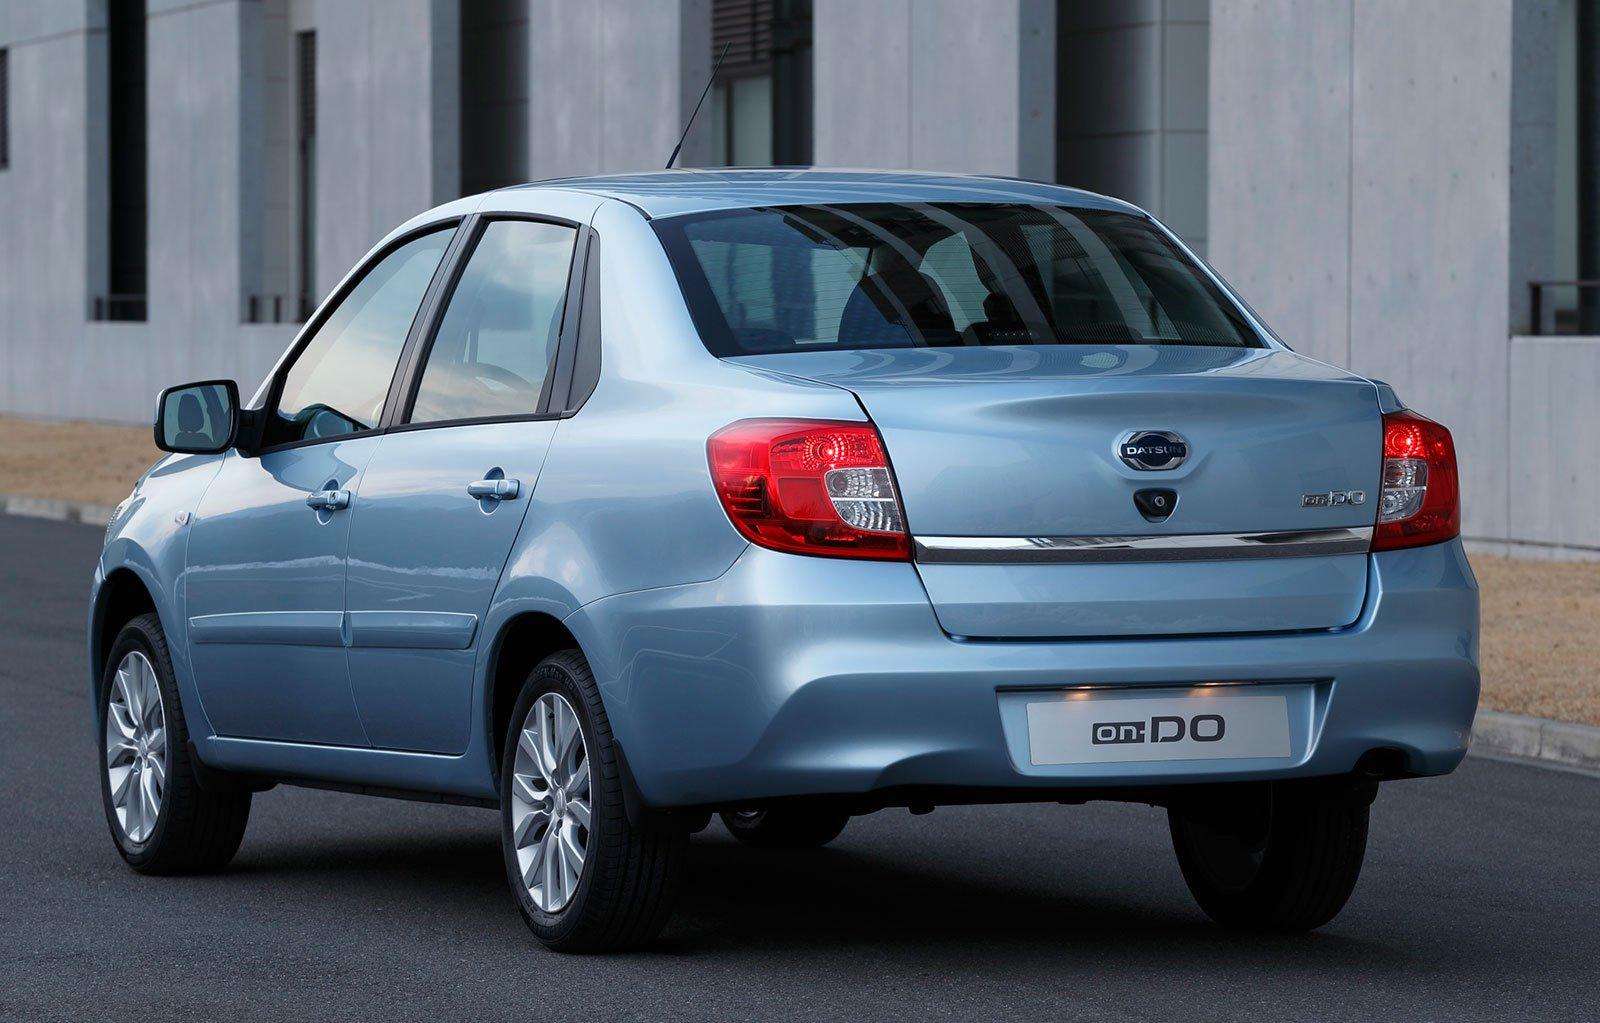 Datsun on-DO sedan – based on Lada, made in Russia Paul ...